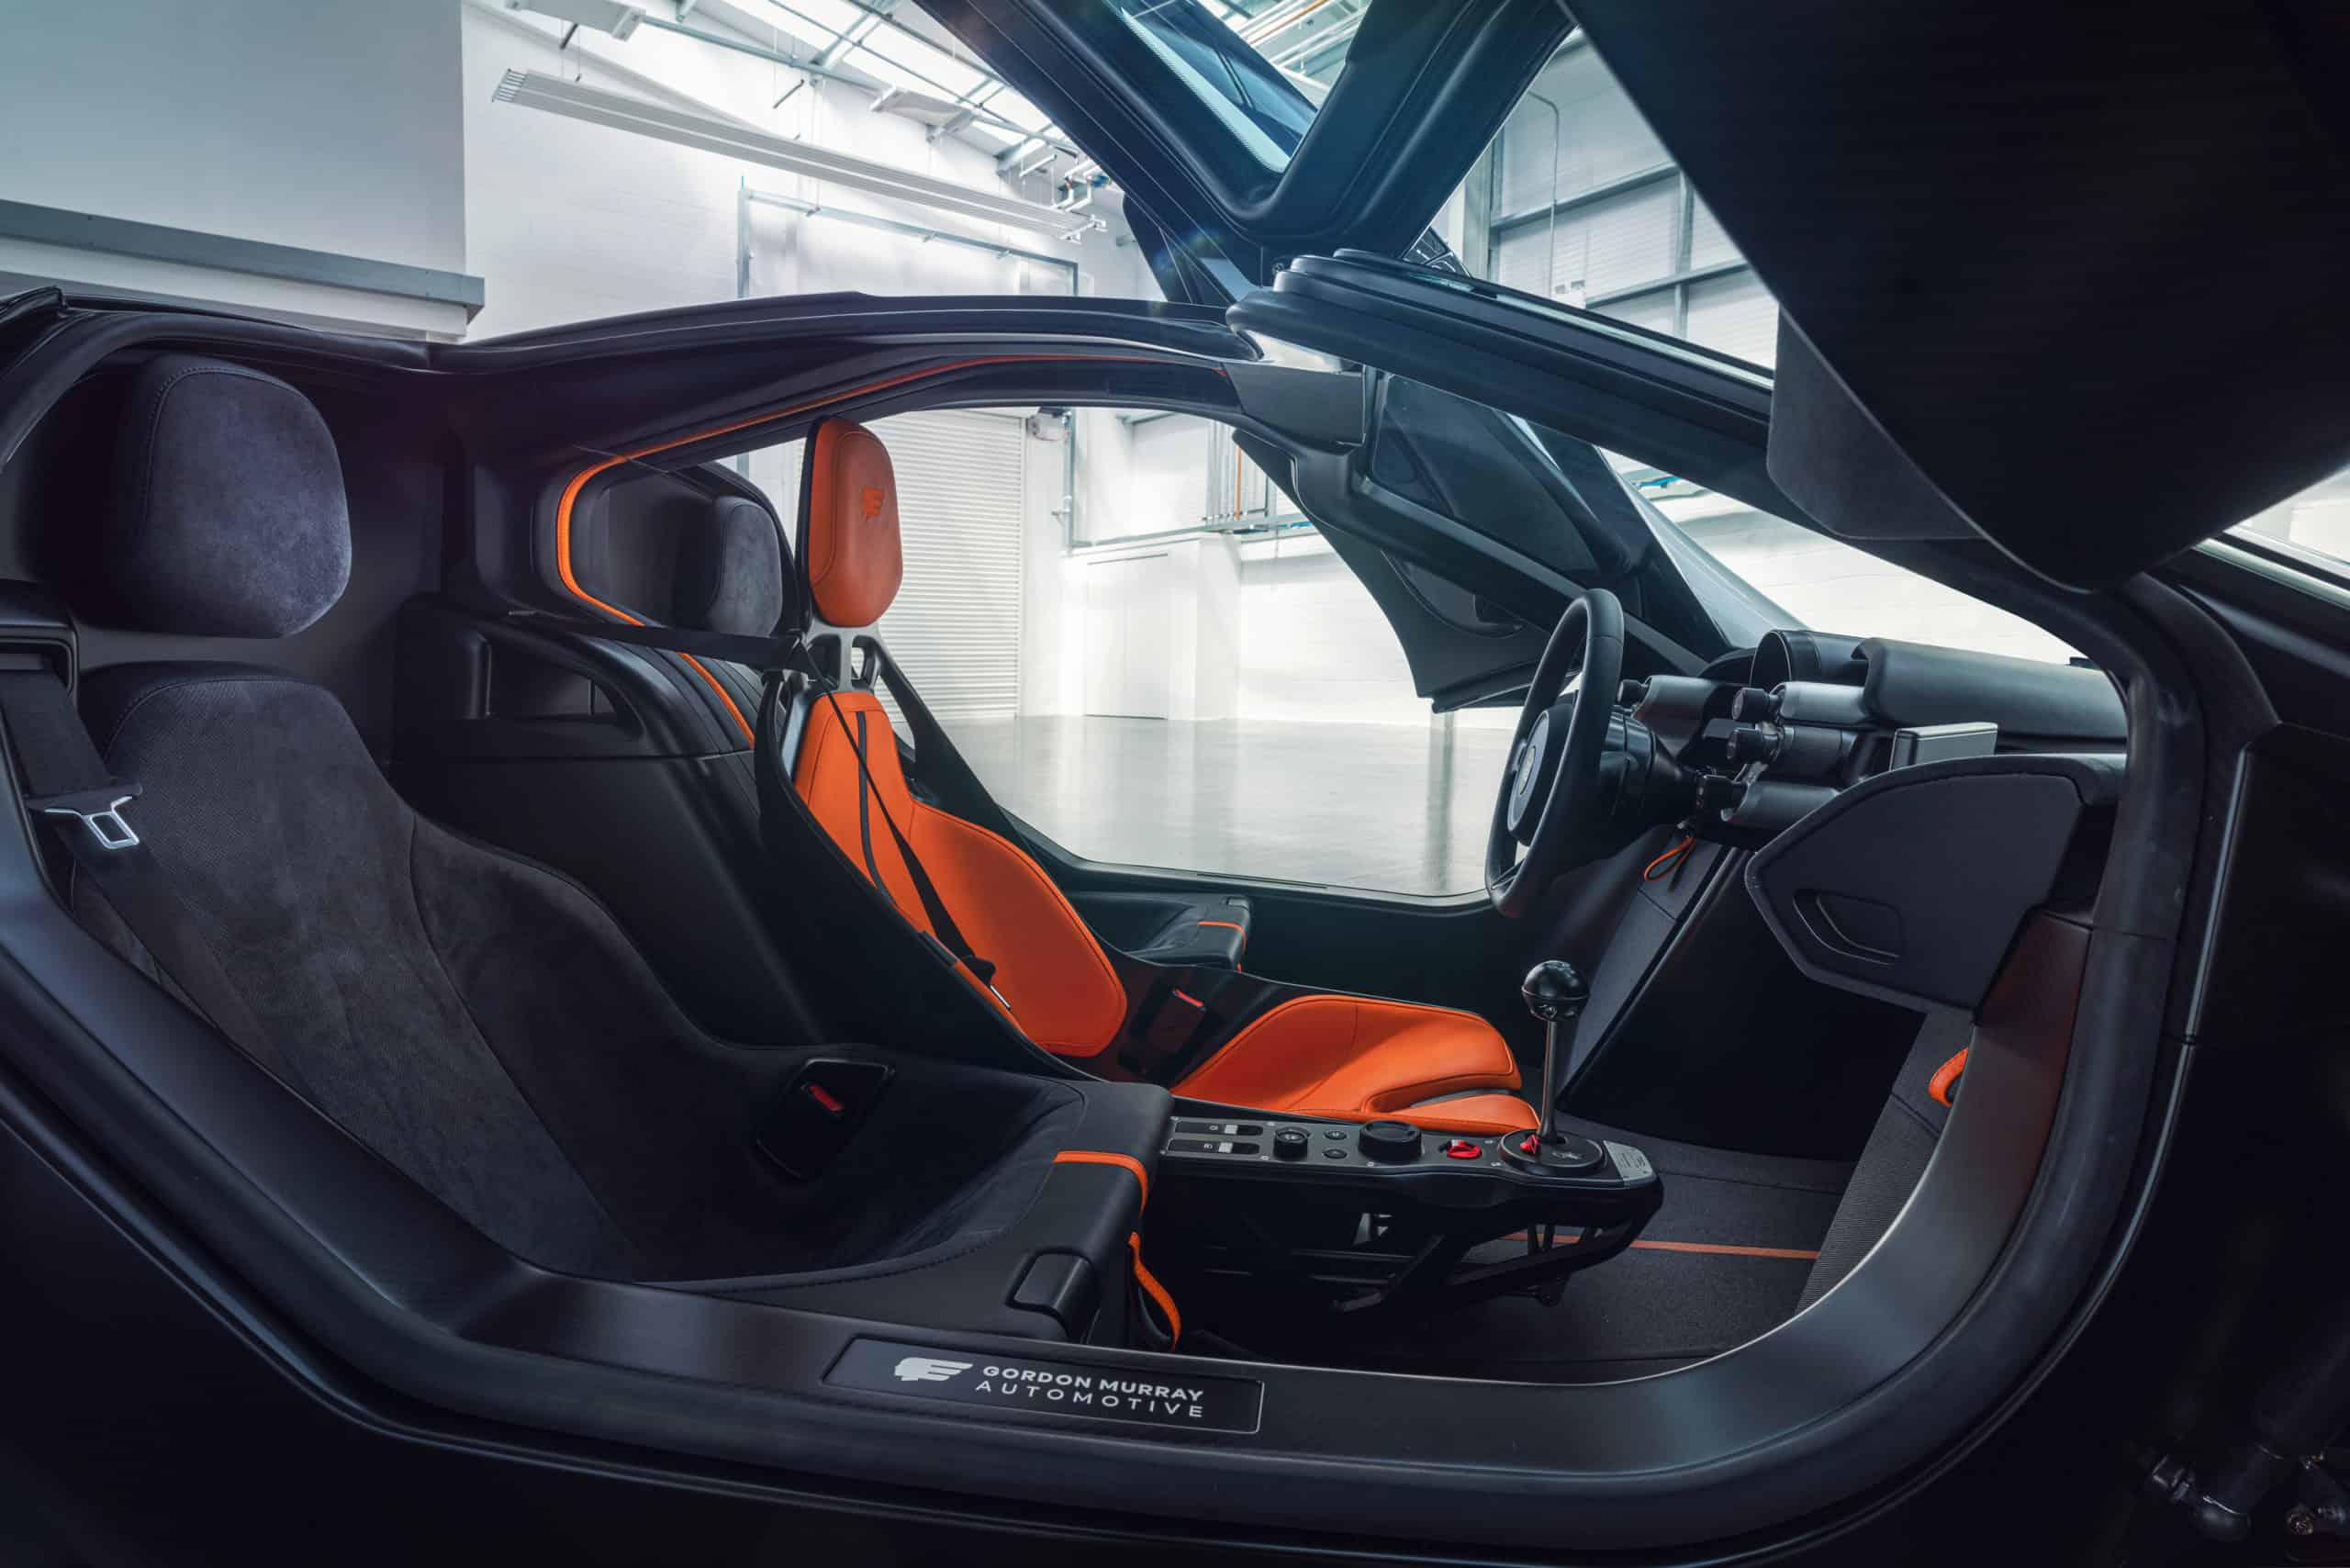 Gordon Murry Automotive T.50 supercar interior